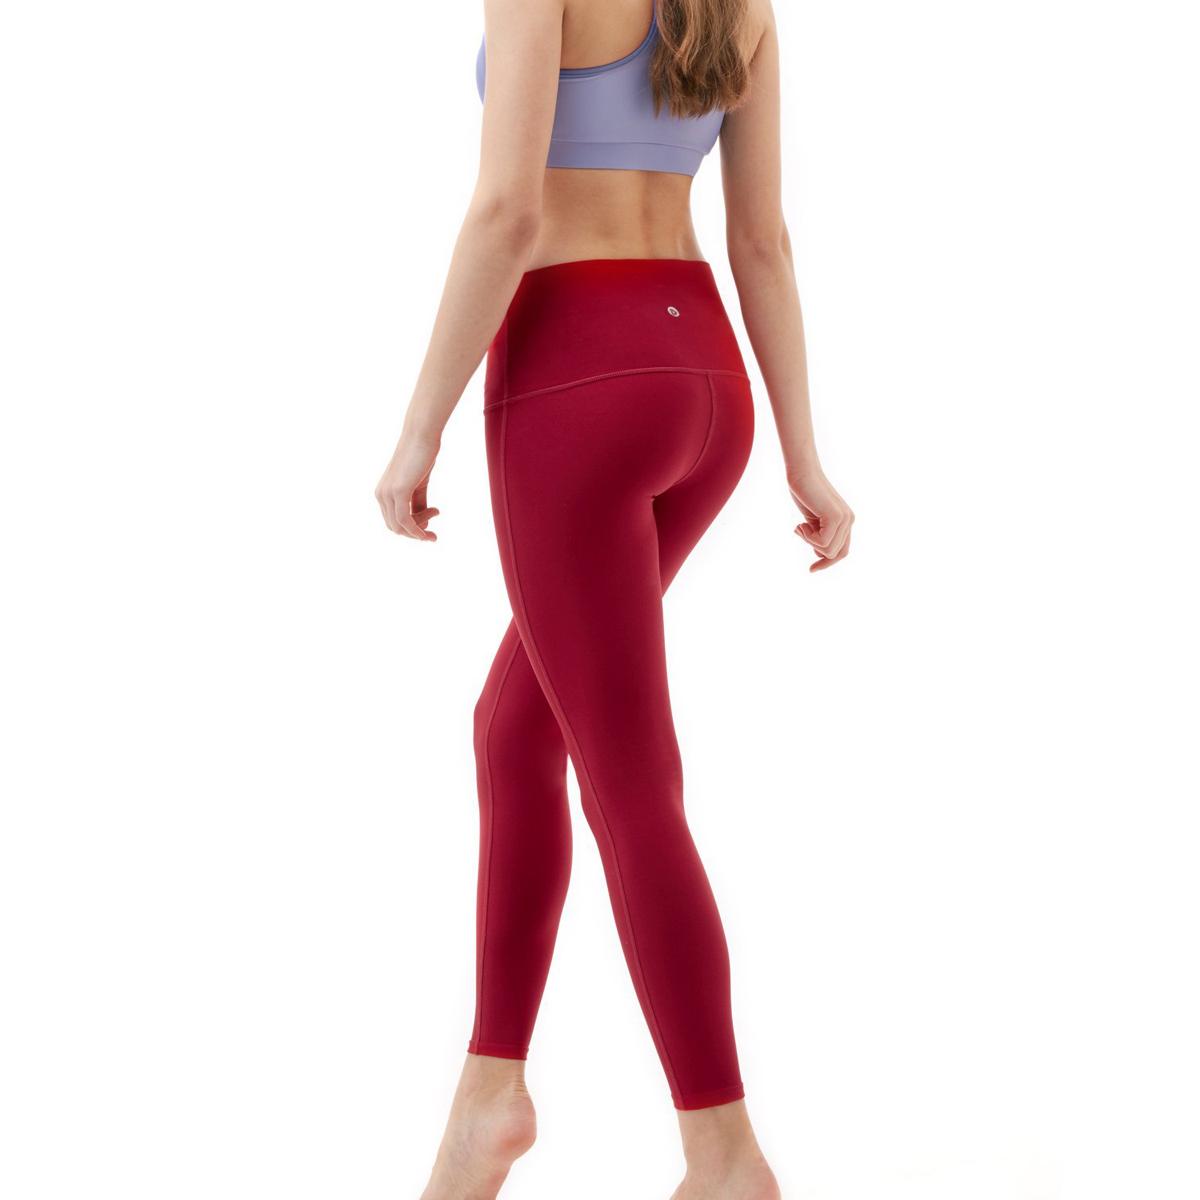 thumbnail 72 - TSLA Tesla FYP42 Women's High-Waisted Ultra-Stretch Tummy Control Yoga Pants